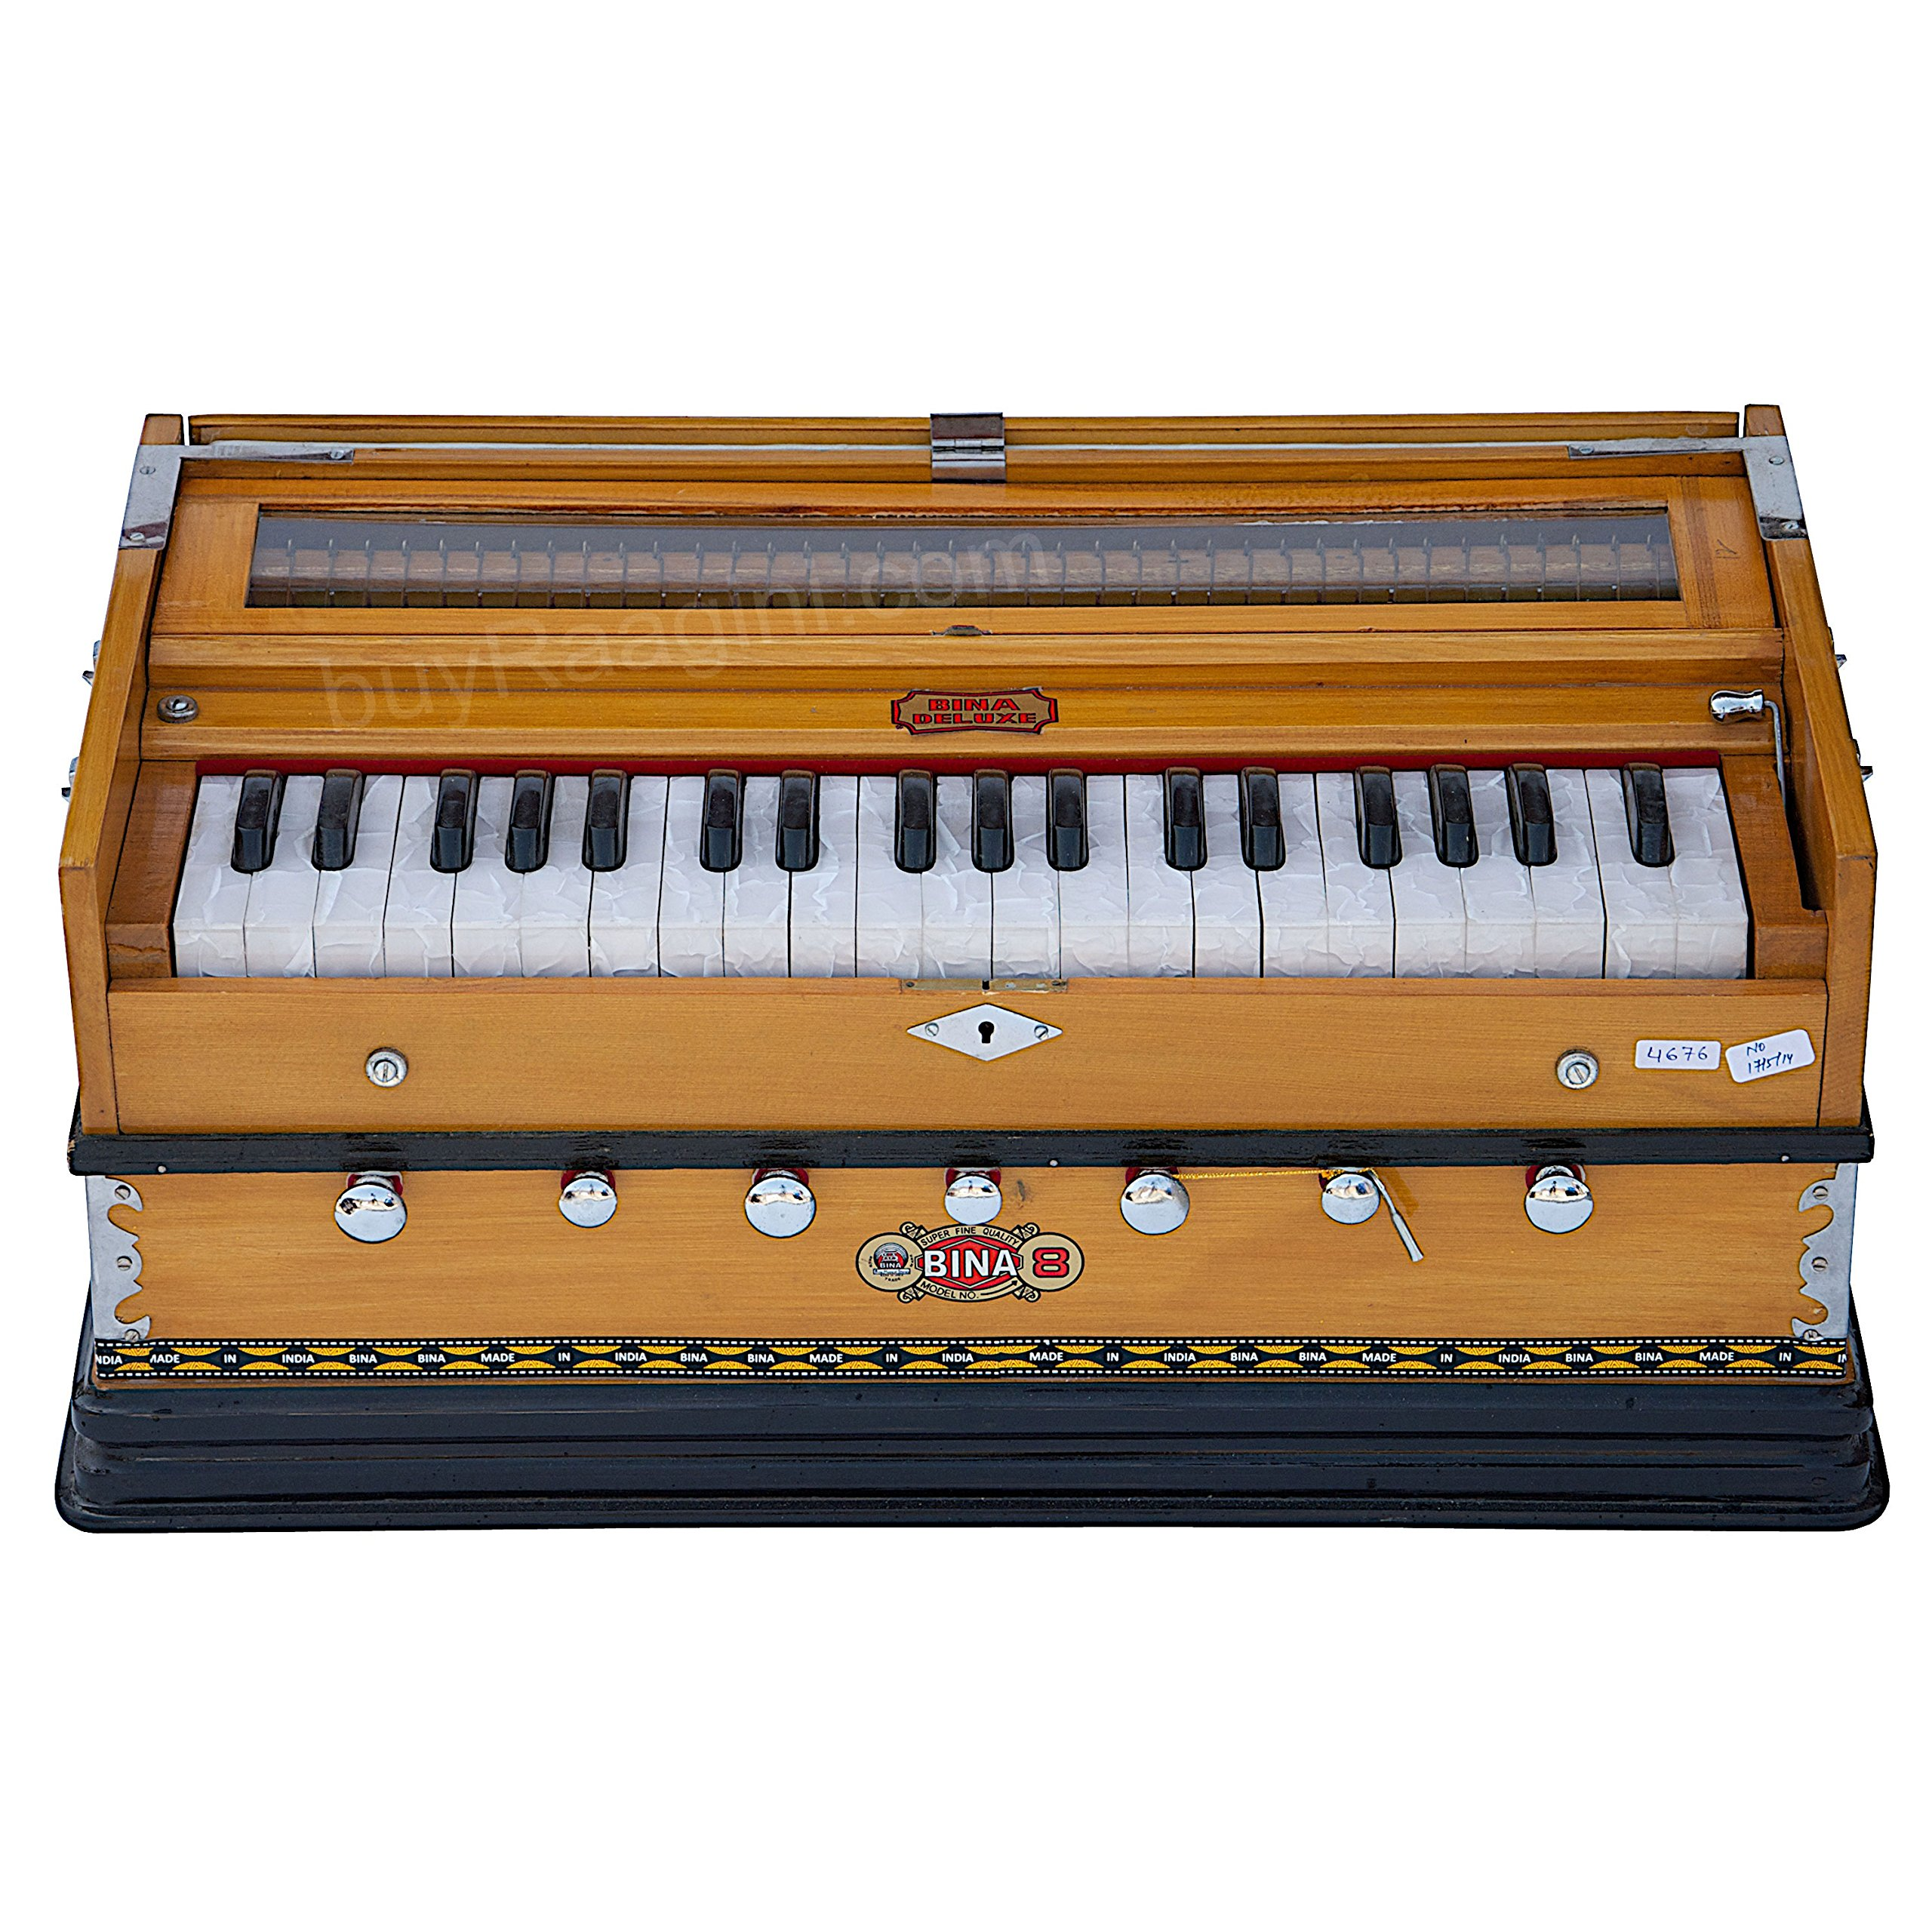 Harmonium Musical Instrument, BINA No. 8, 7 Stops, 3 1/4 Octaves, Coupler, Tuned To A400, Double Reed, Natural Color, Book, Nylon Bag (PDI-DJF) by Bina (Image #2)